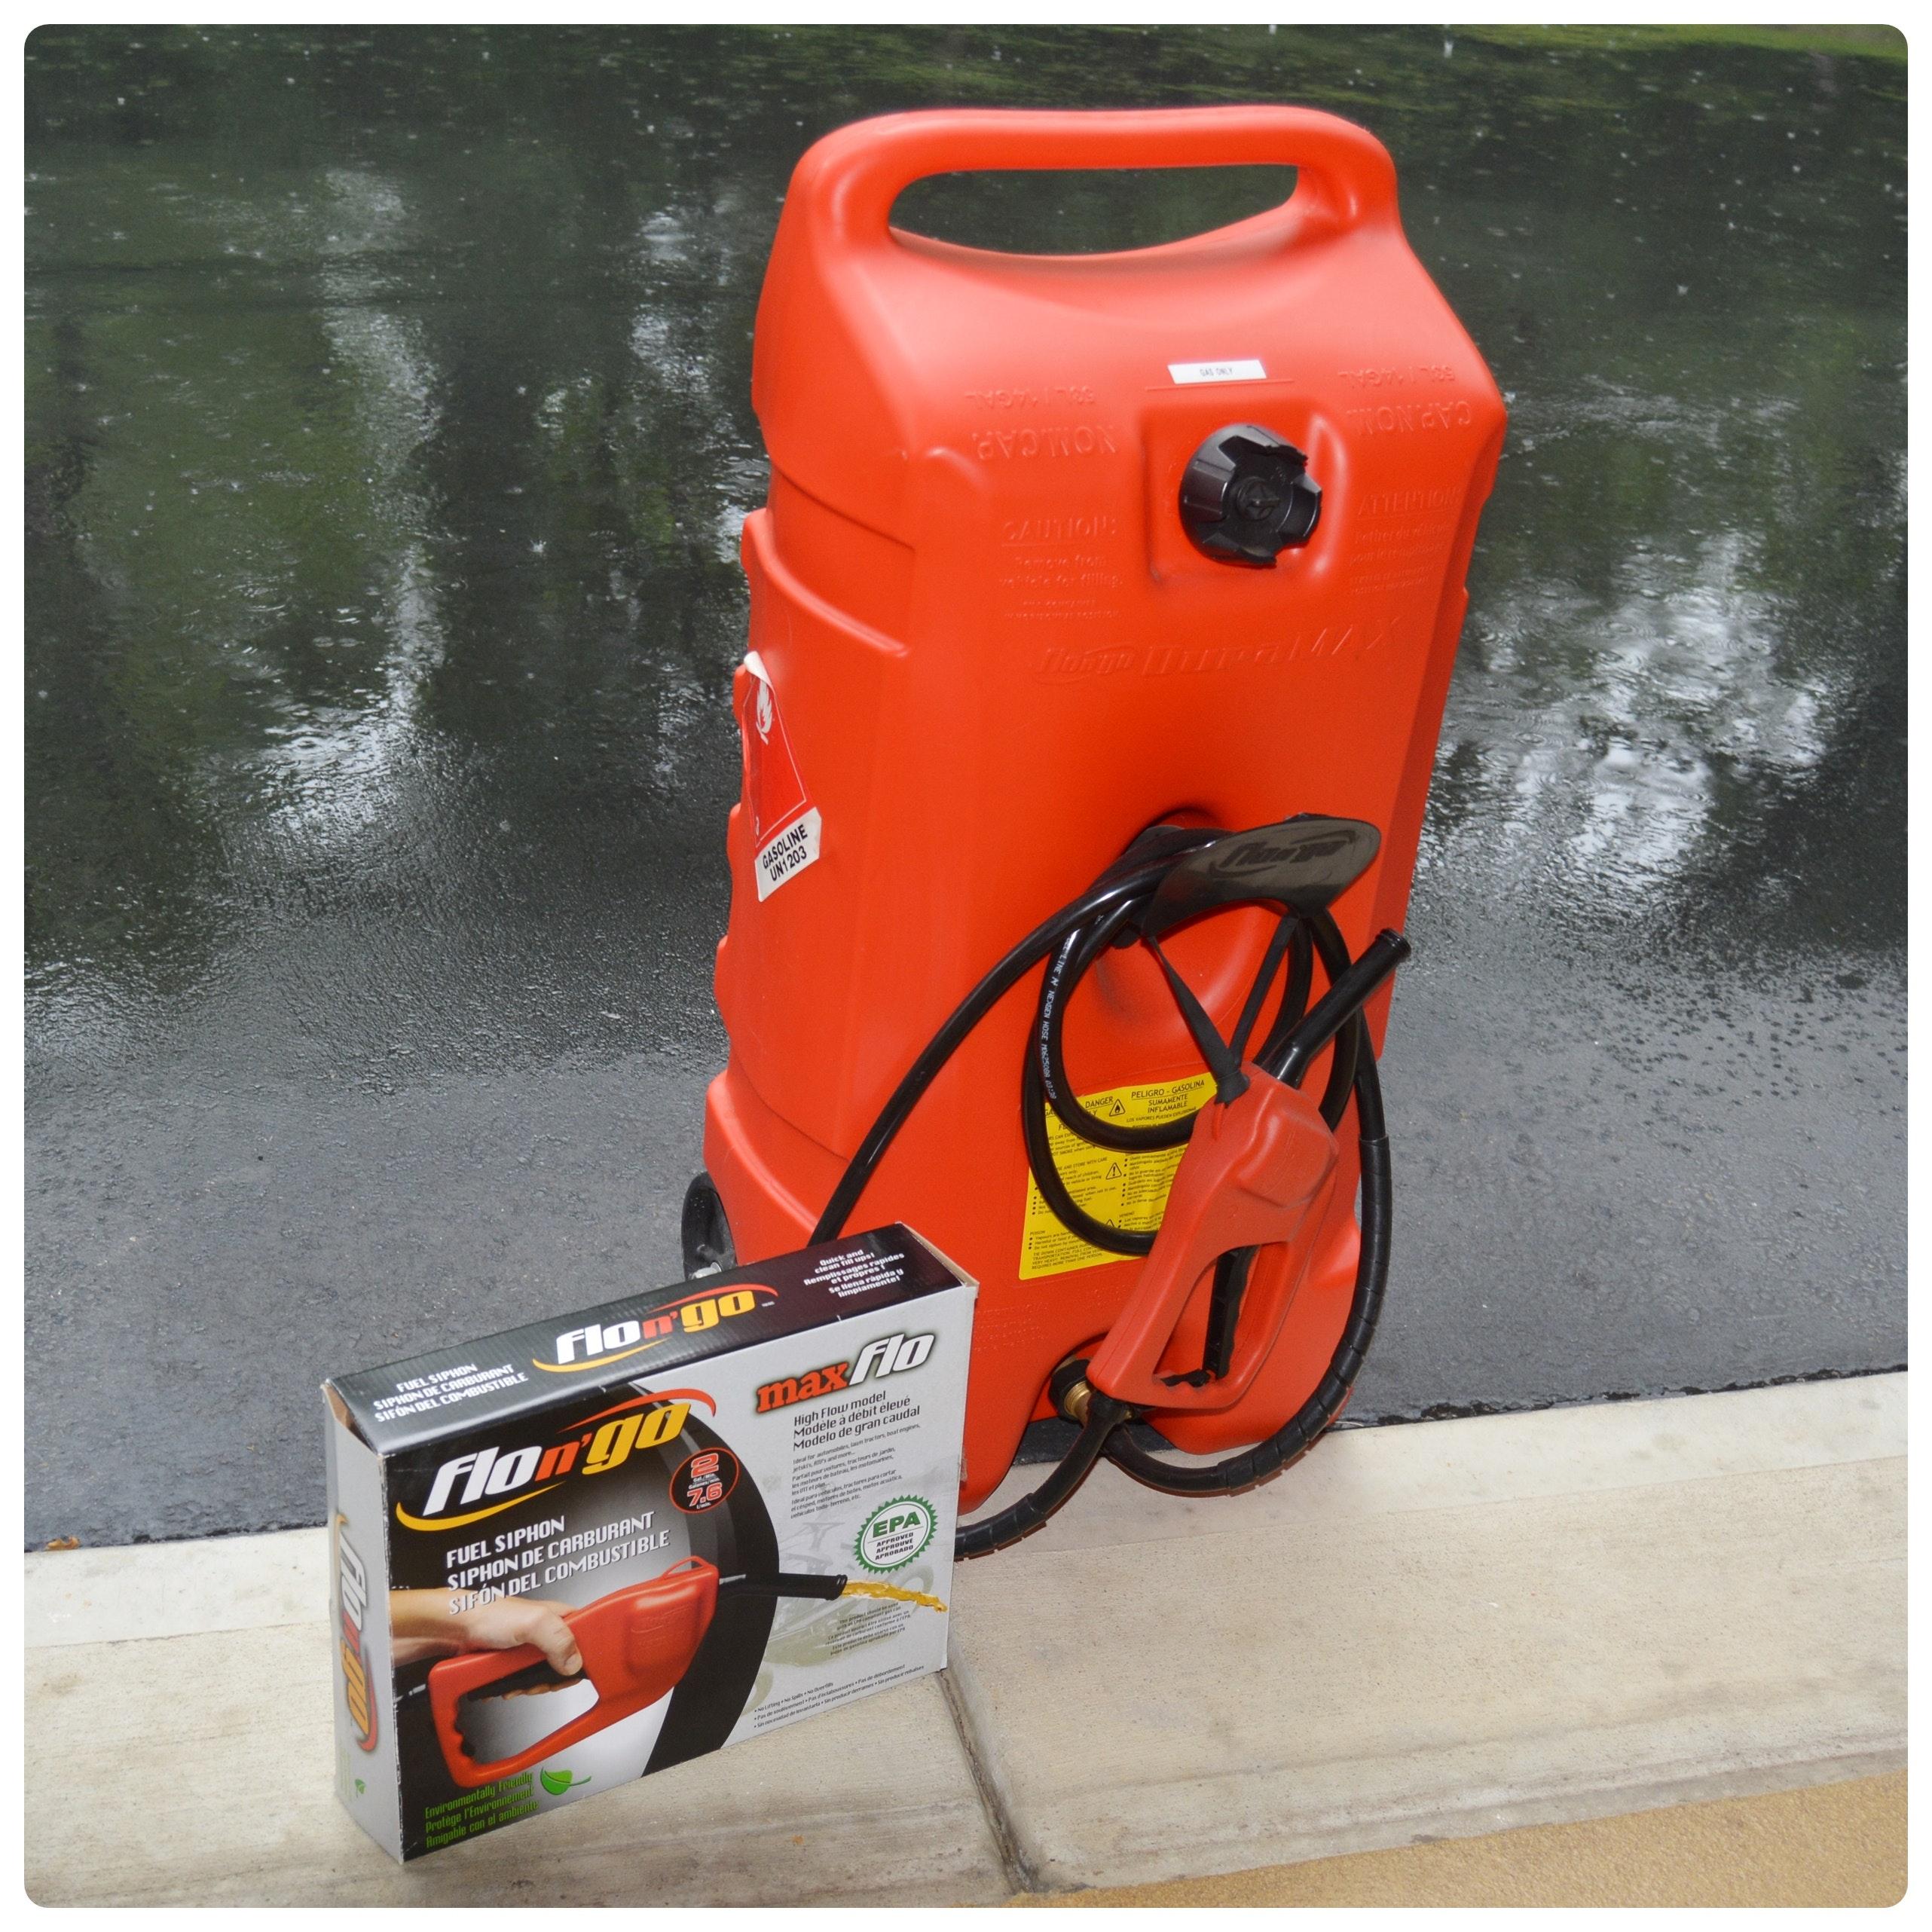 Flo-N-Go Duramax 14 Gallon Gas Tank and Fuel Siphon